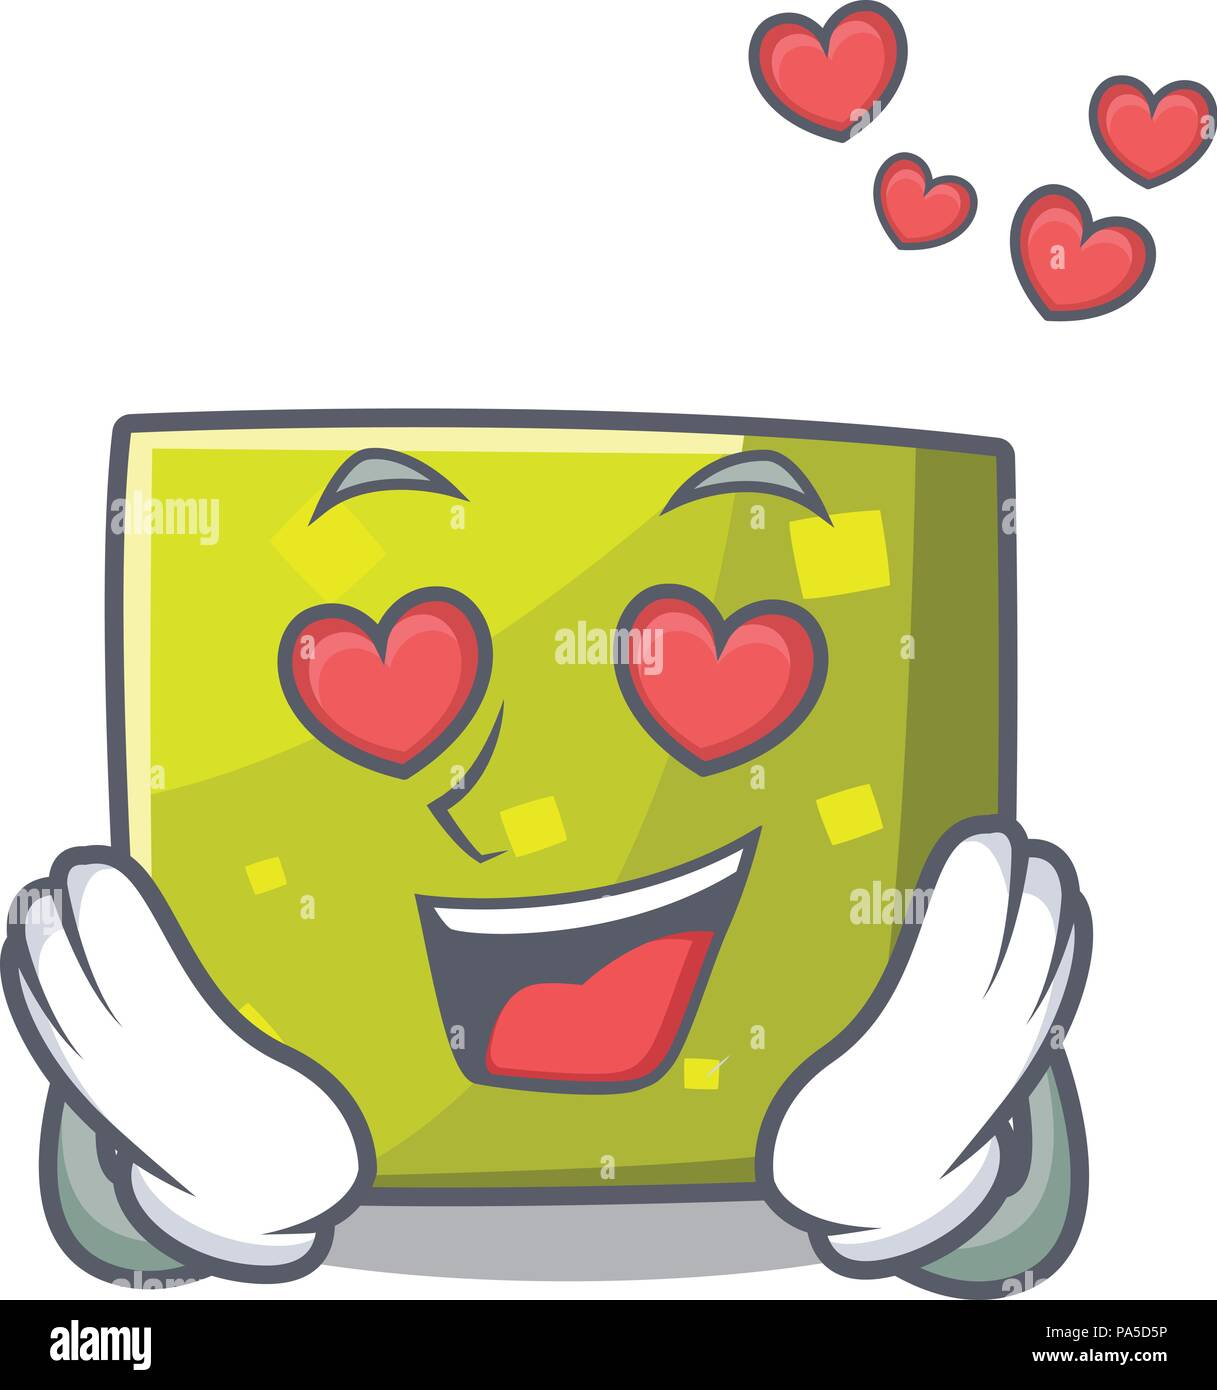 In love square mascot cartoon style Stock Vector Art   Illustration ... 9ef2ab99e7b